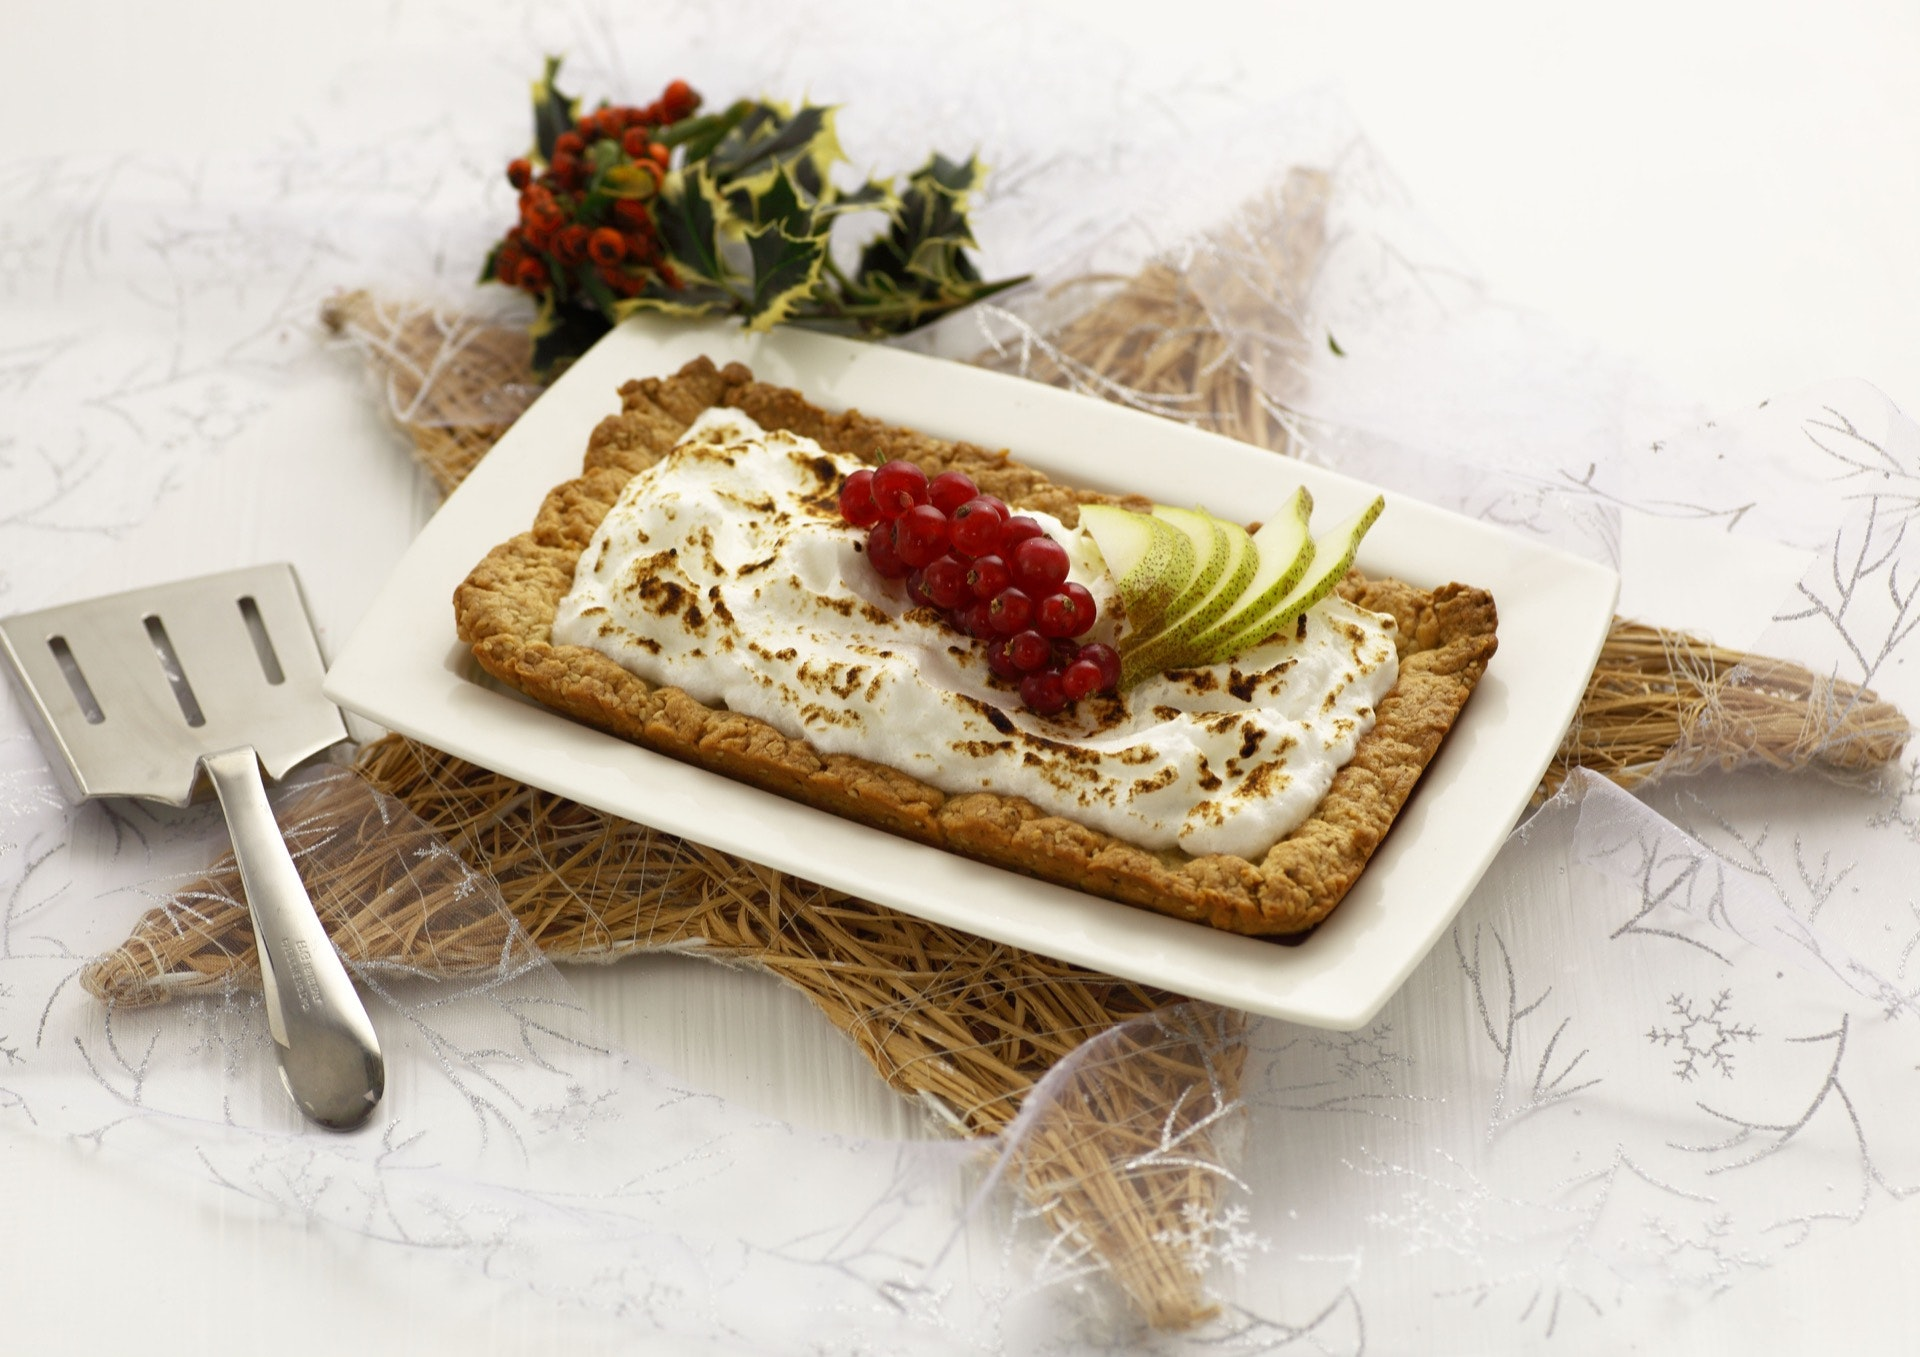 Crostata sesamo e mascarpone - Parmalat